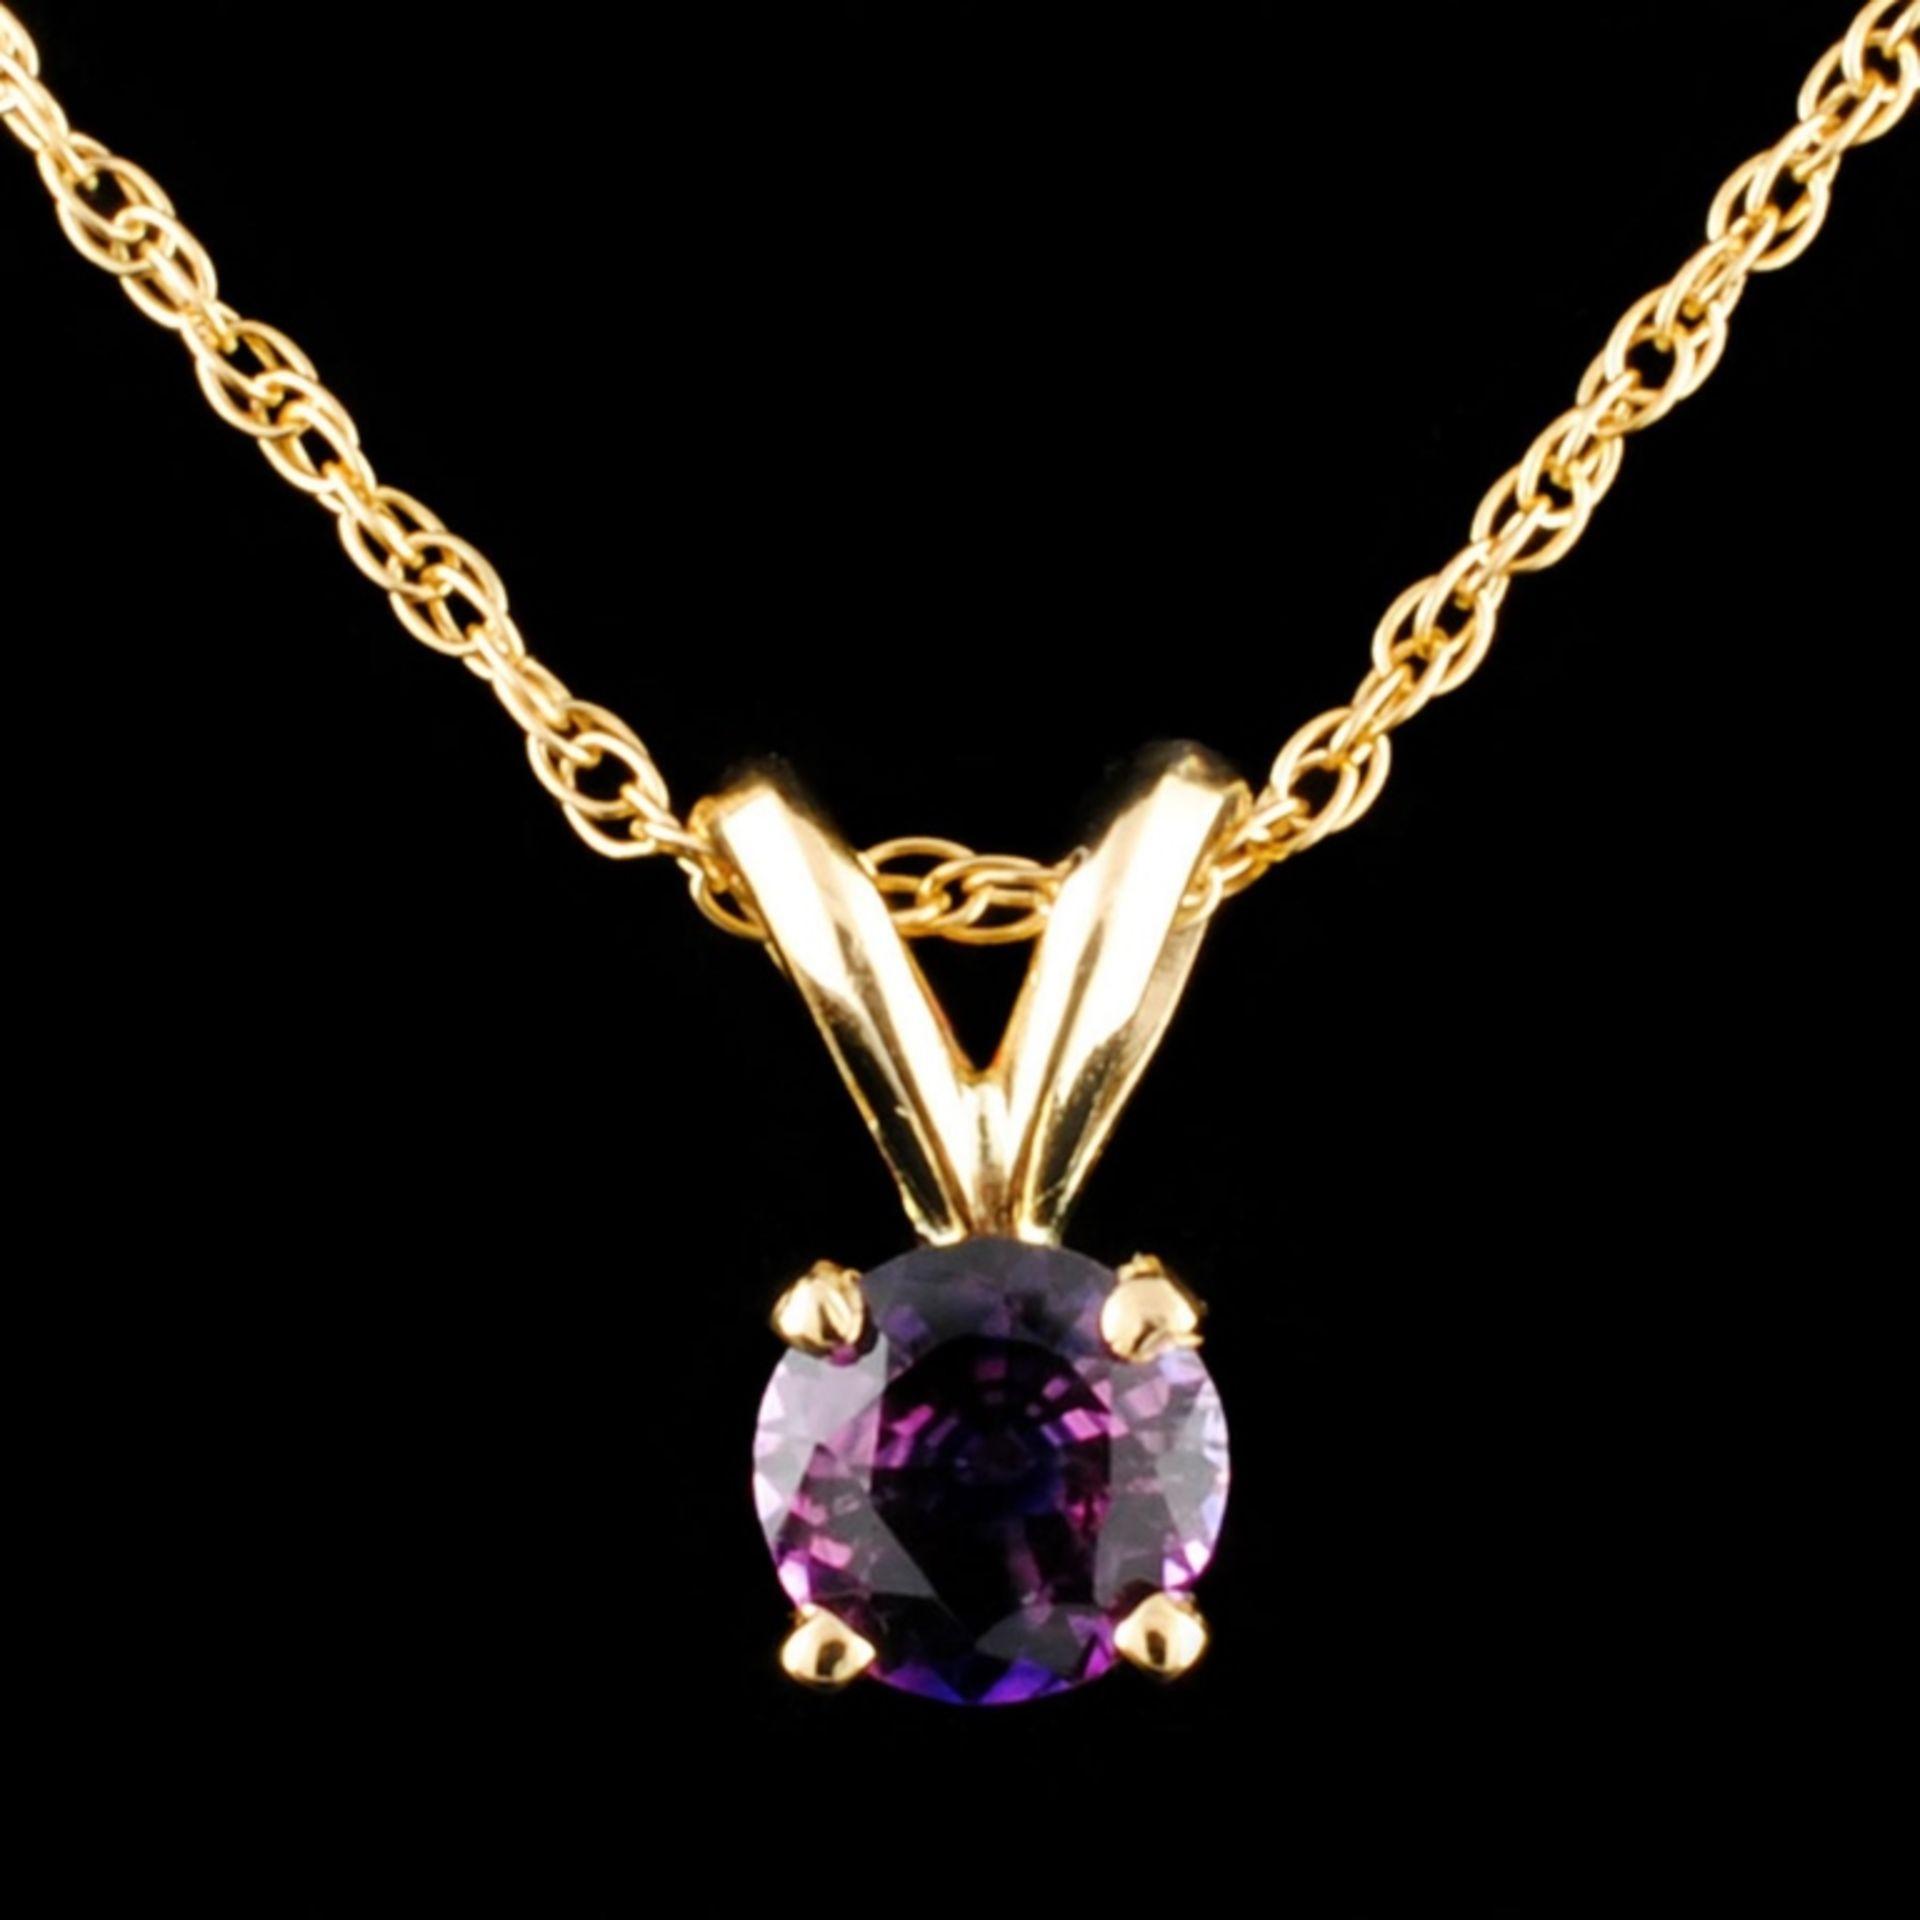 14K Gold 0.50ctw Sapphire Pendant